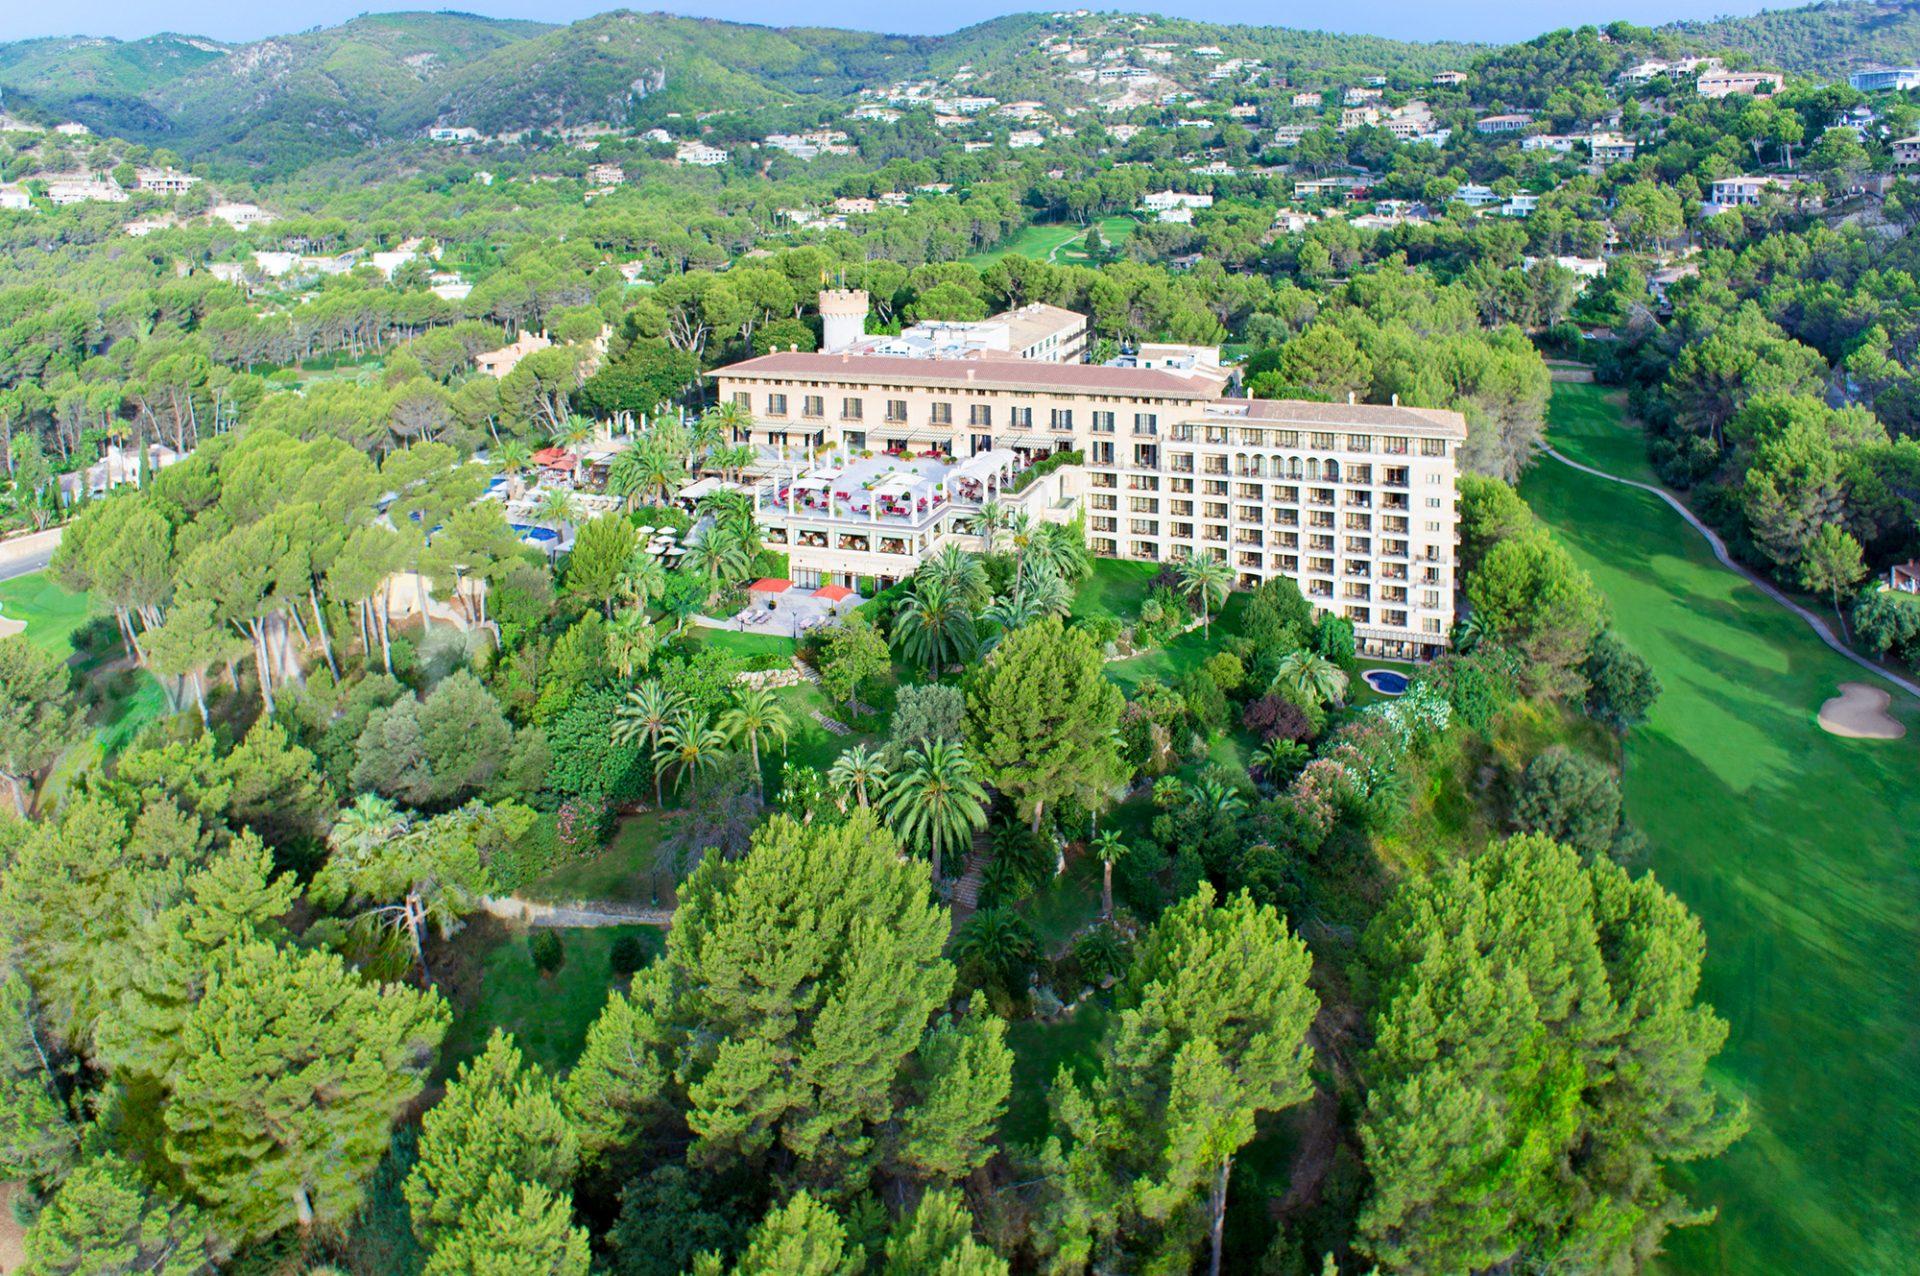 Golfreisen Mallorca - Castillo Hotel Son Vida